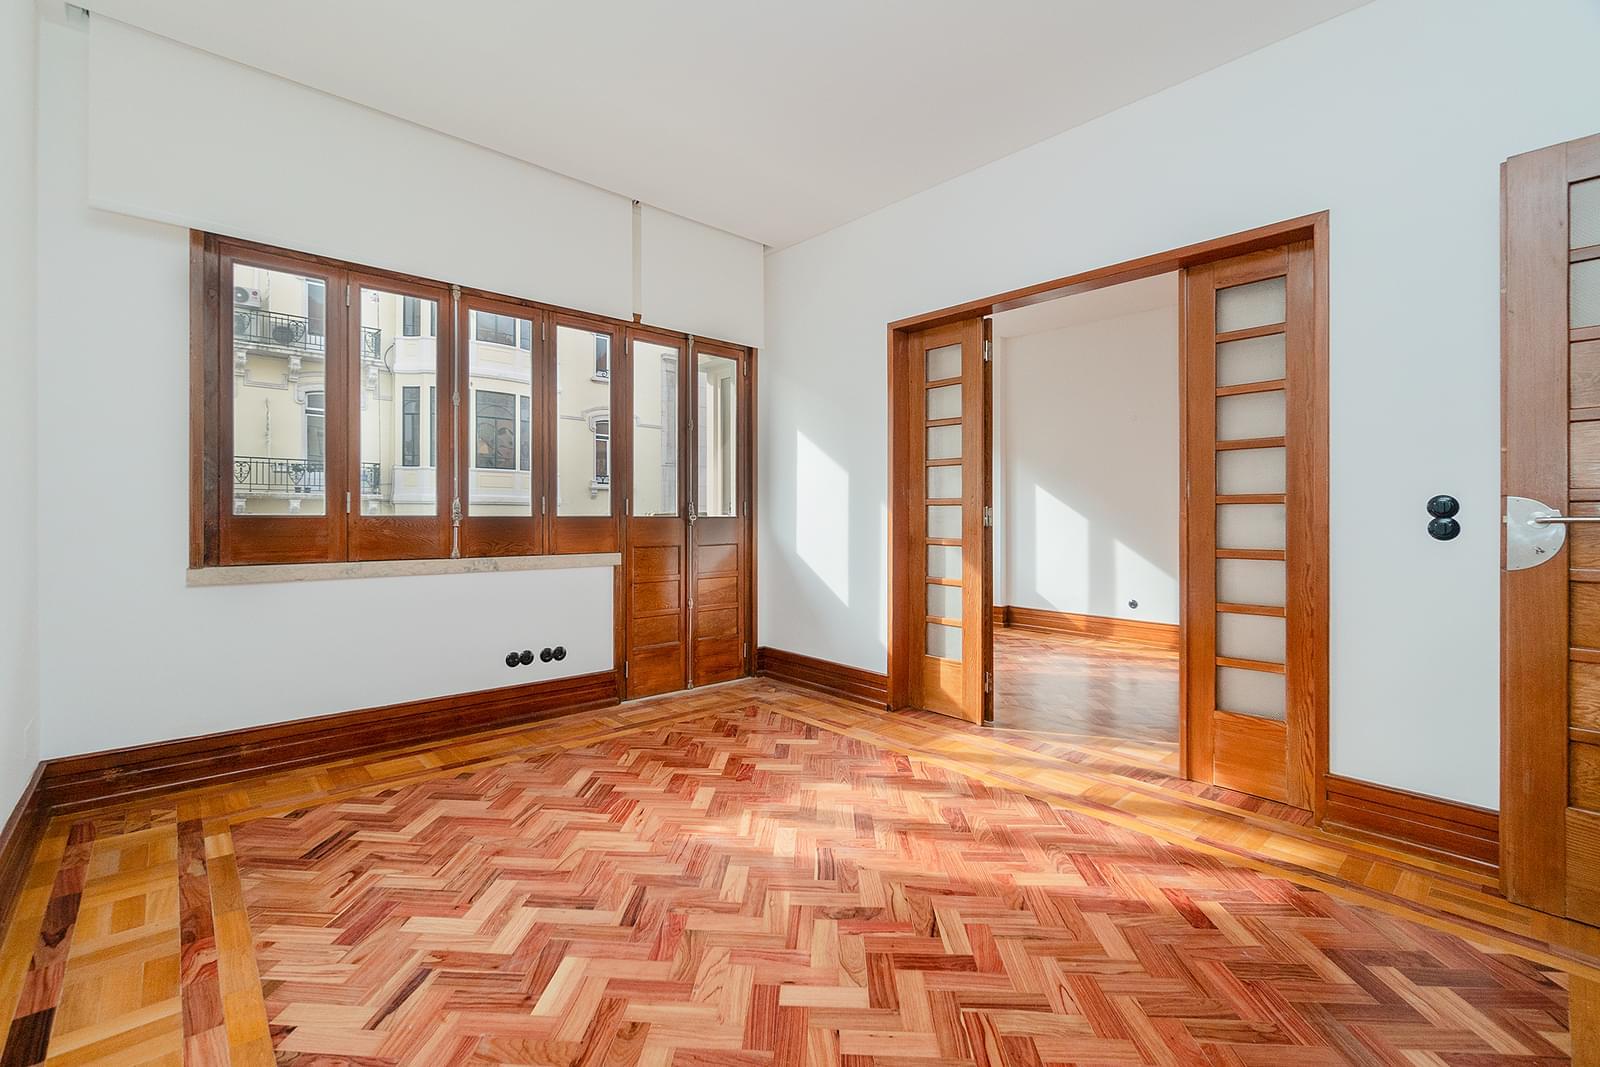 pf18665-apartamento-t3-2-lisboa-6390fd80-f5c2-46f7-9420-1c9ed6ca2256